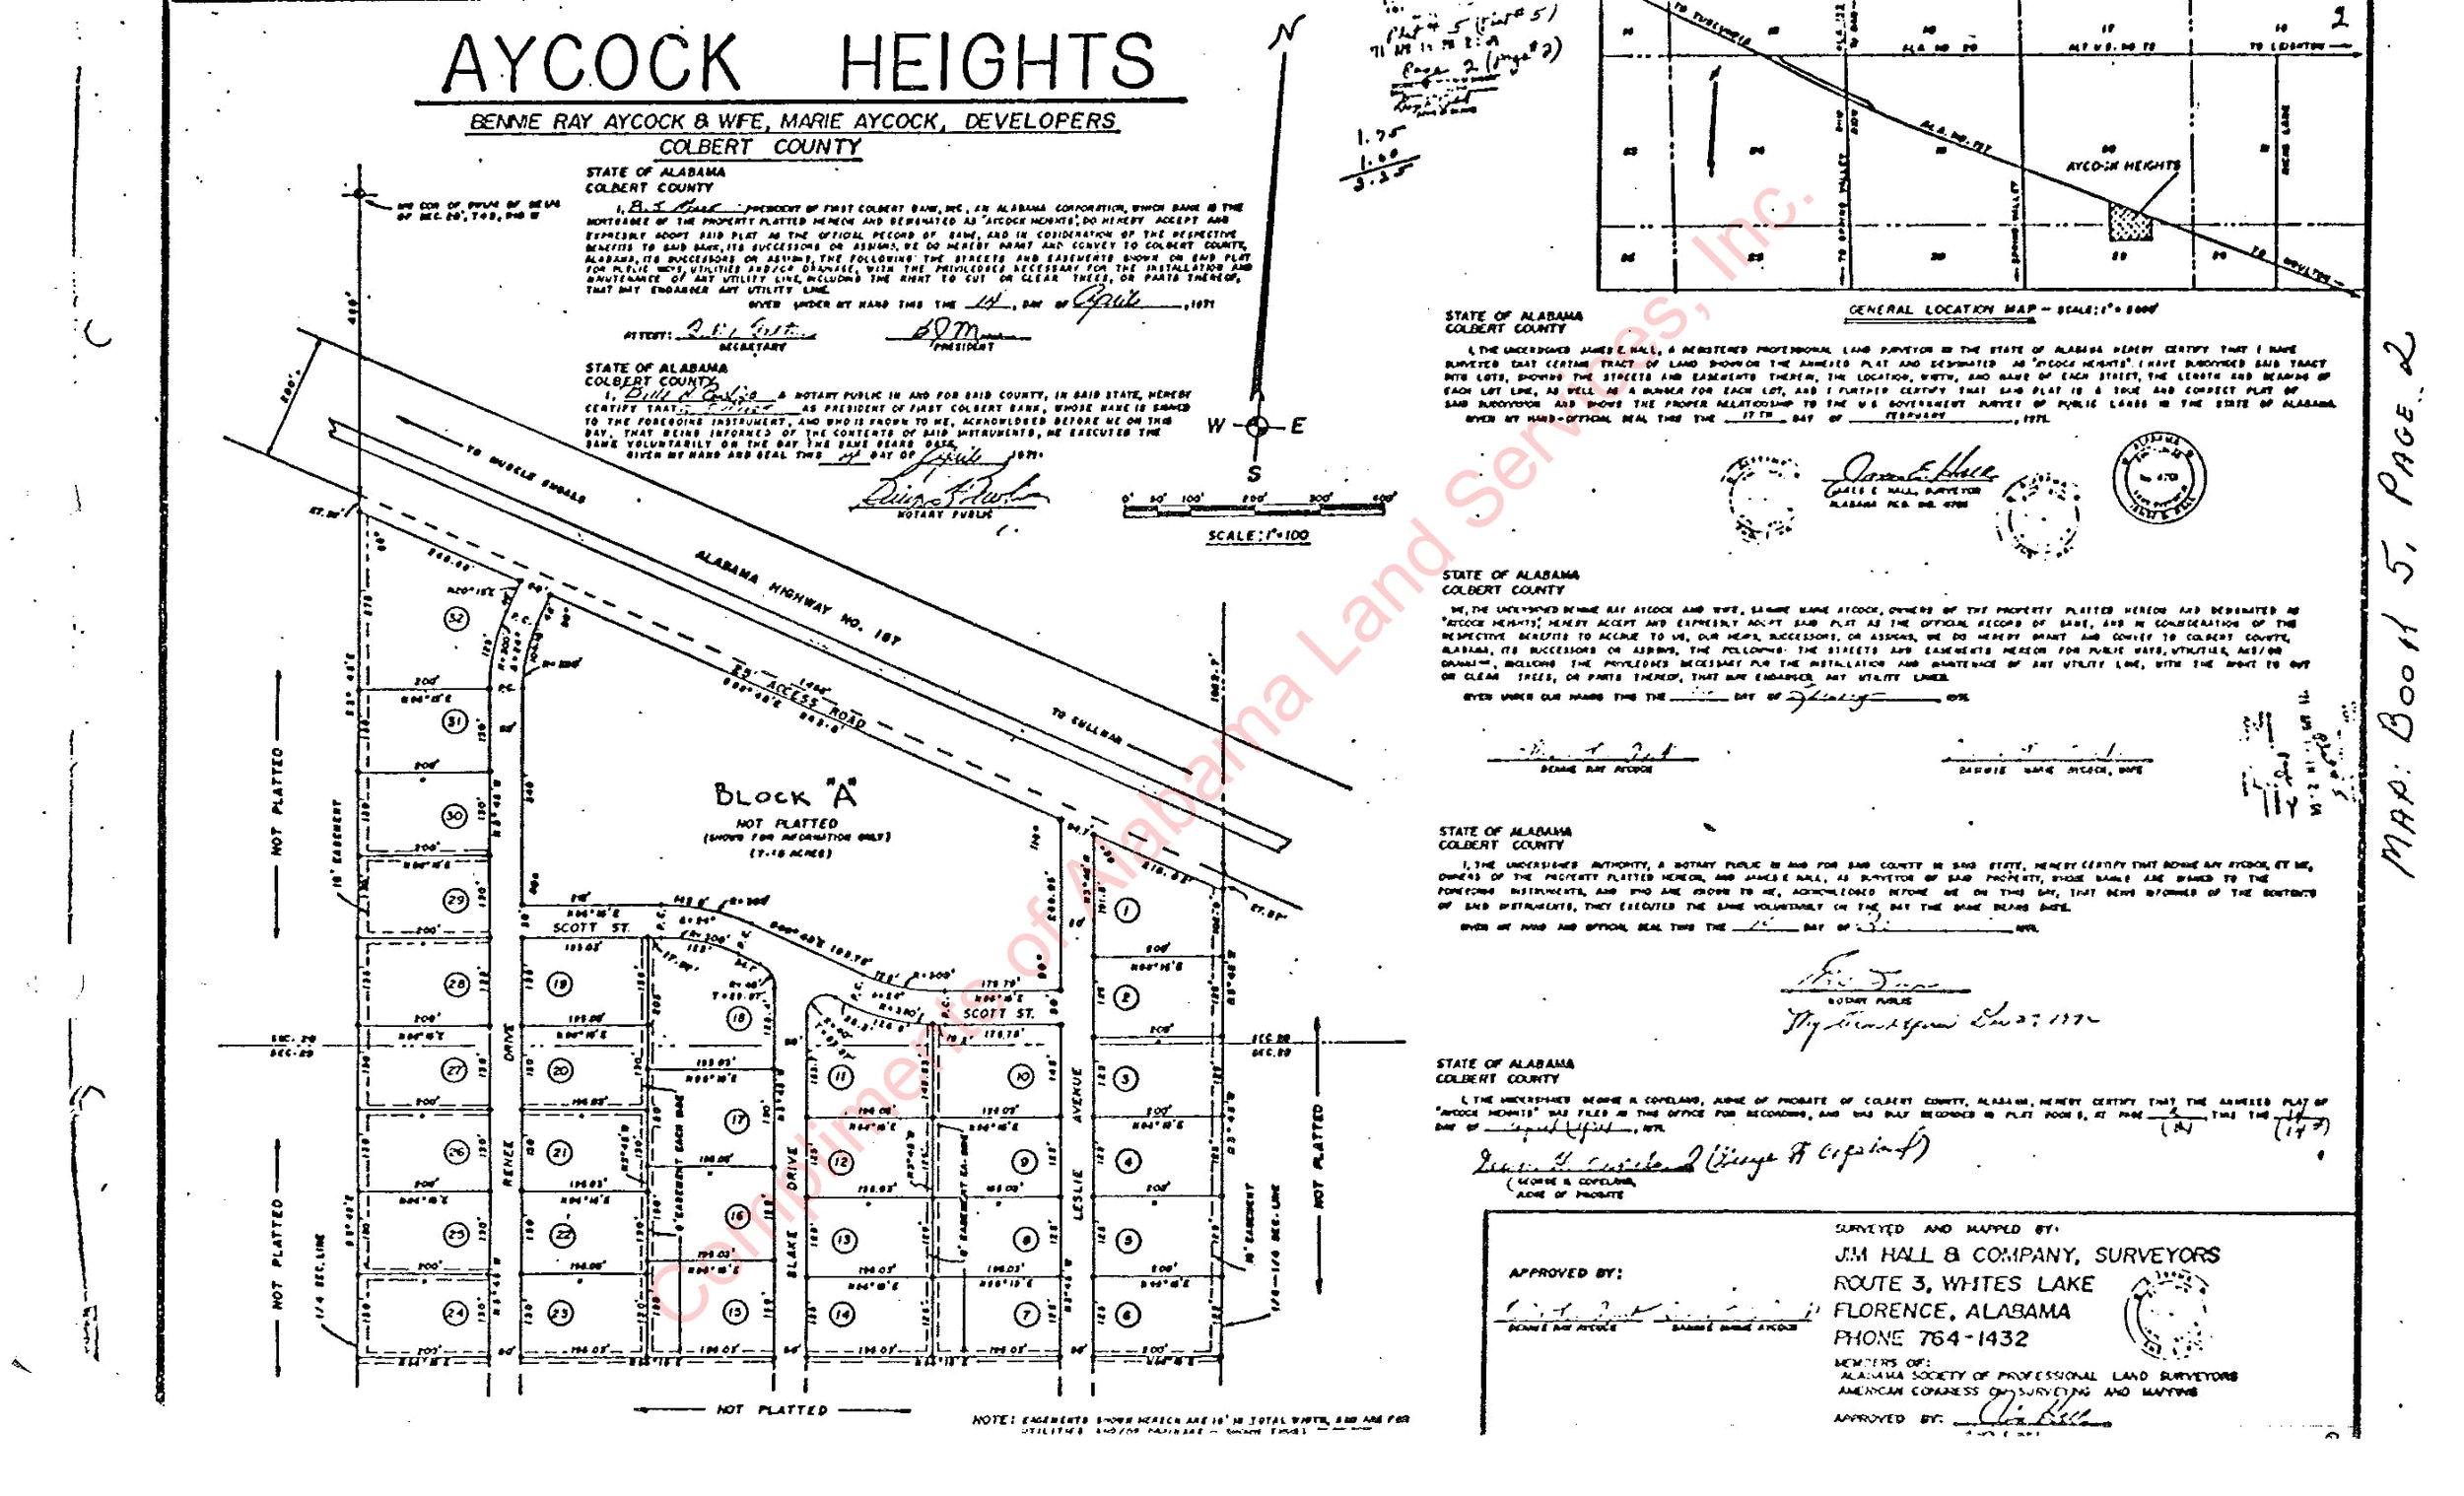 Aycock Heights plat-03.jpg